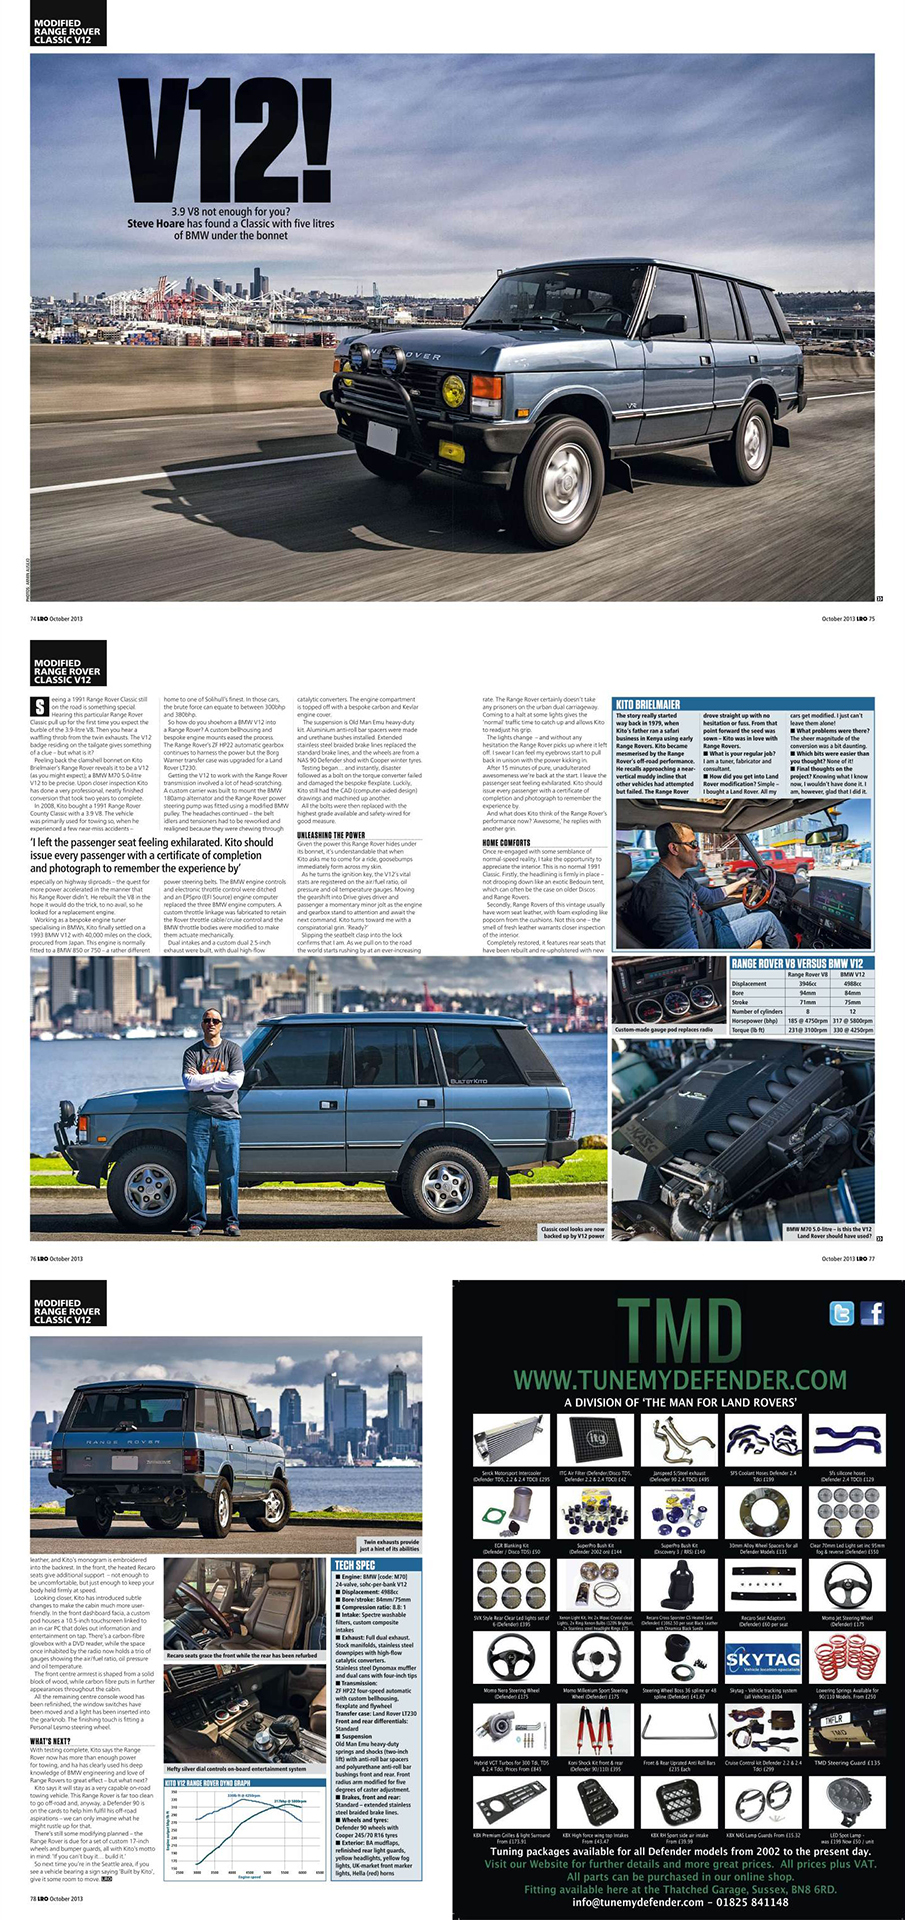 Kito's V12 Range Rover for LRO